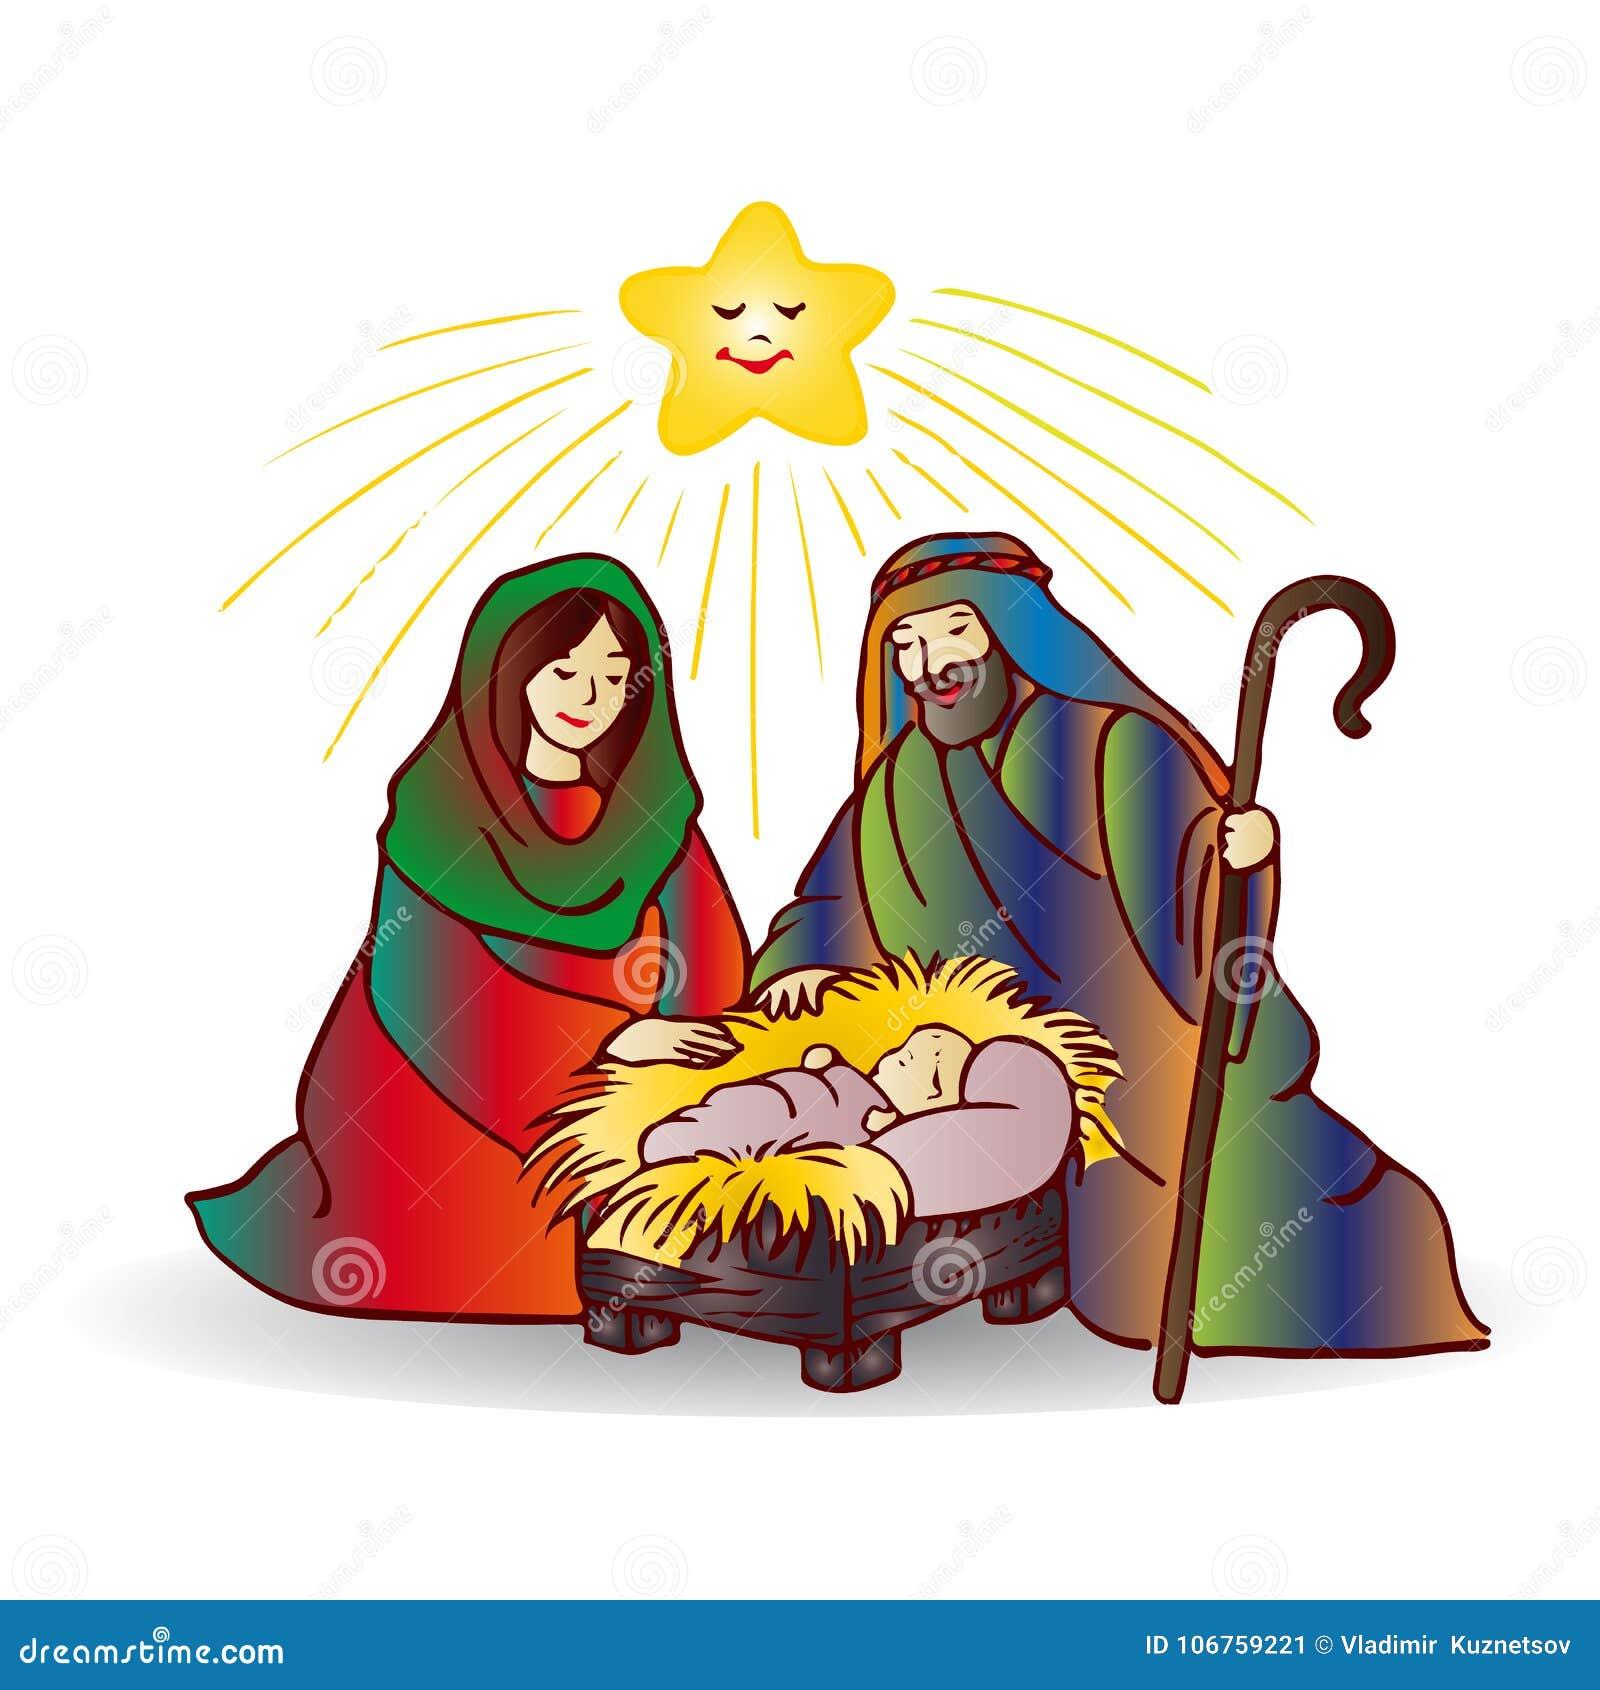 Image De Noel Jesus.Illustration De Noel Jesus Christ Bande Dessinee Sur Le